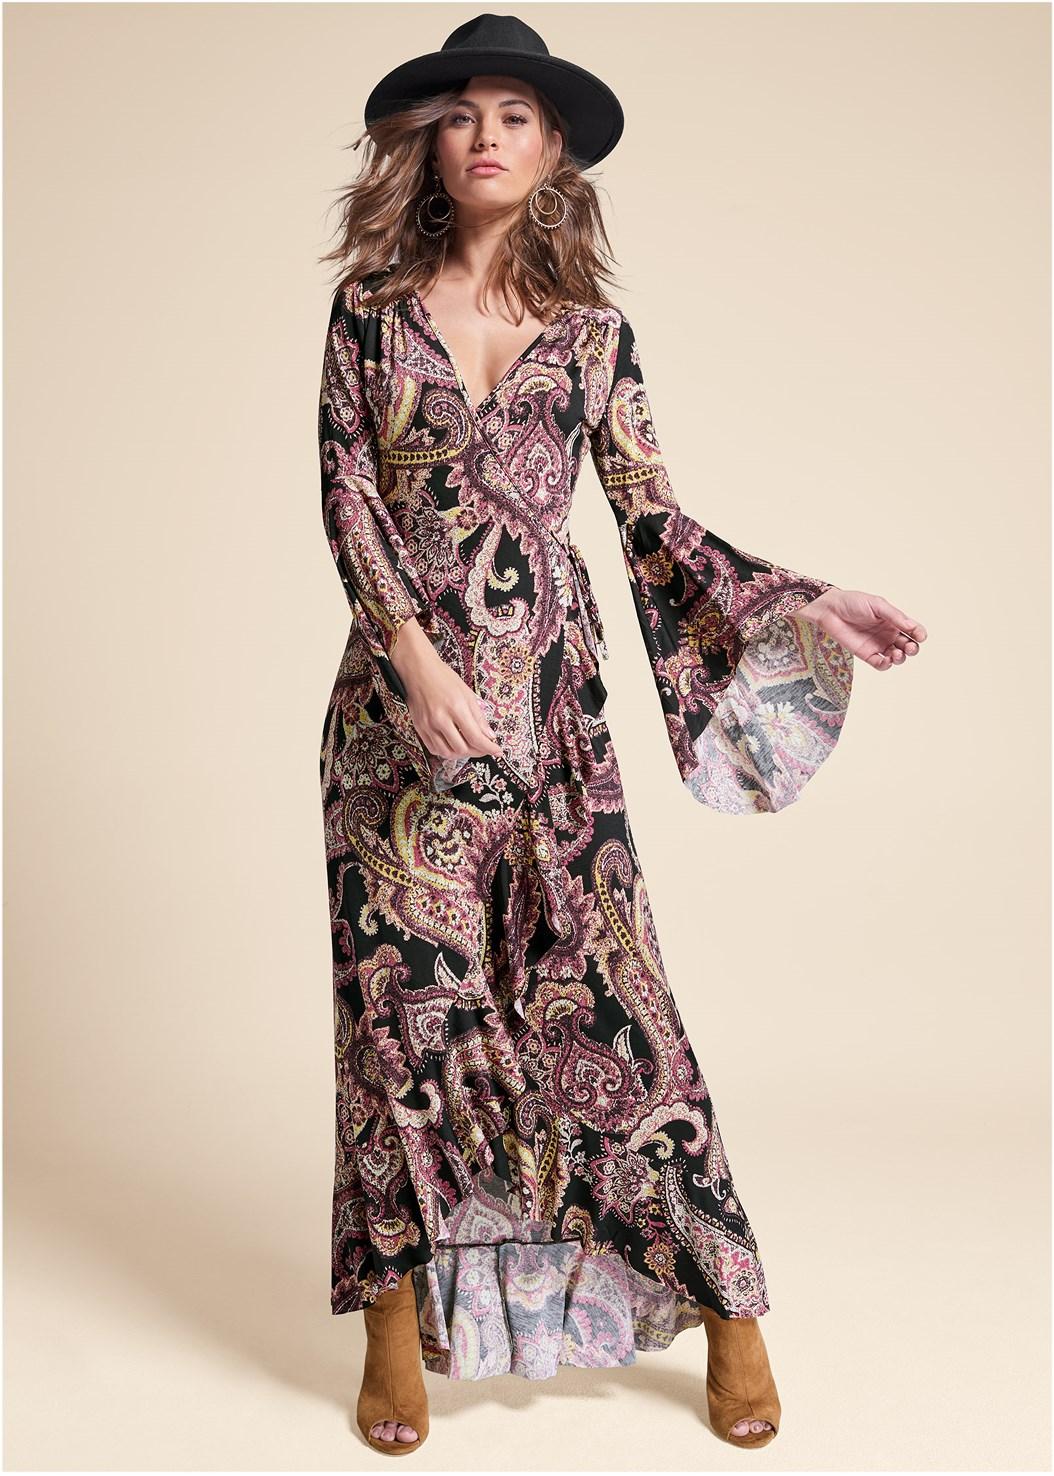 Paisely Printed Wrap Dress,Cupid U Plunge Bra,Open Heel Booties,Studded Matte Hoops